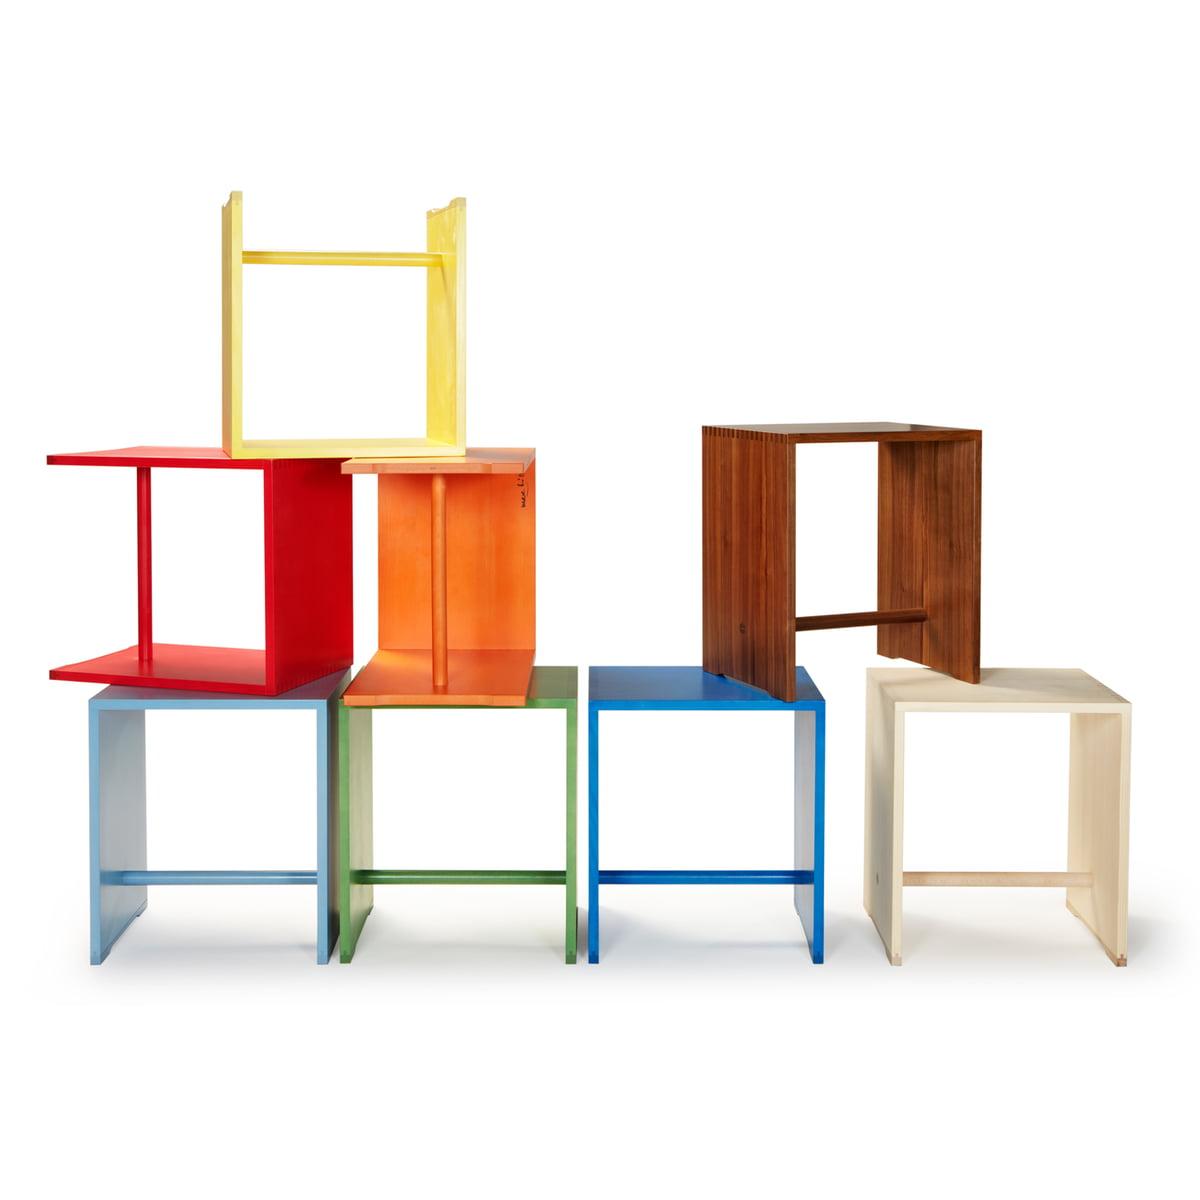 ulmer hocker von wb form im wohndesign shop. Black Bedroom Furniture Sets. Home Design Ideas